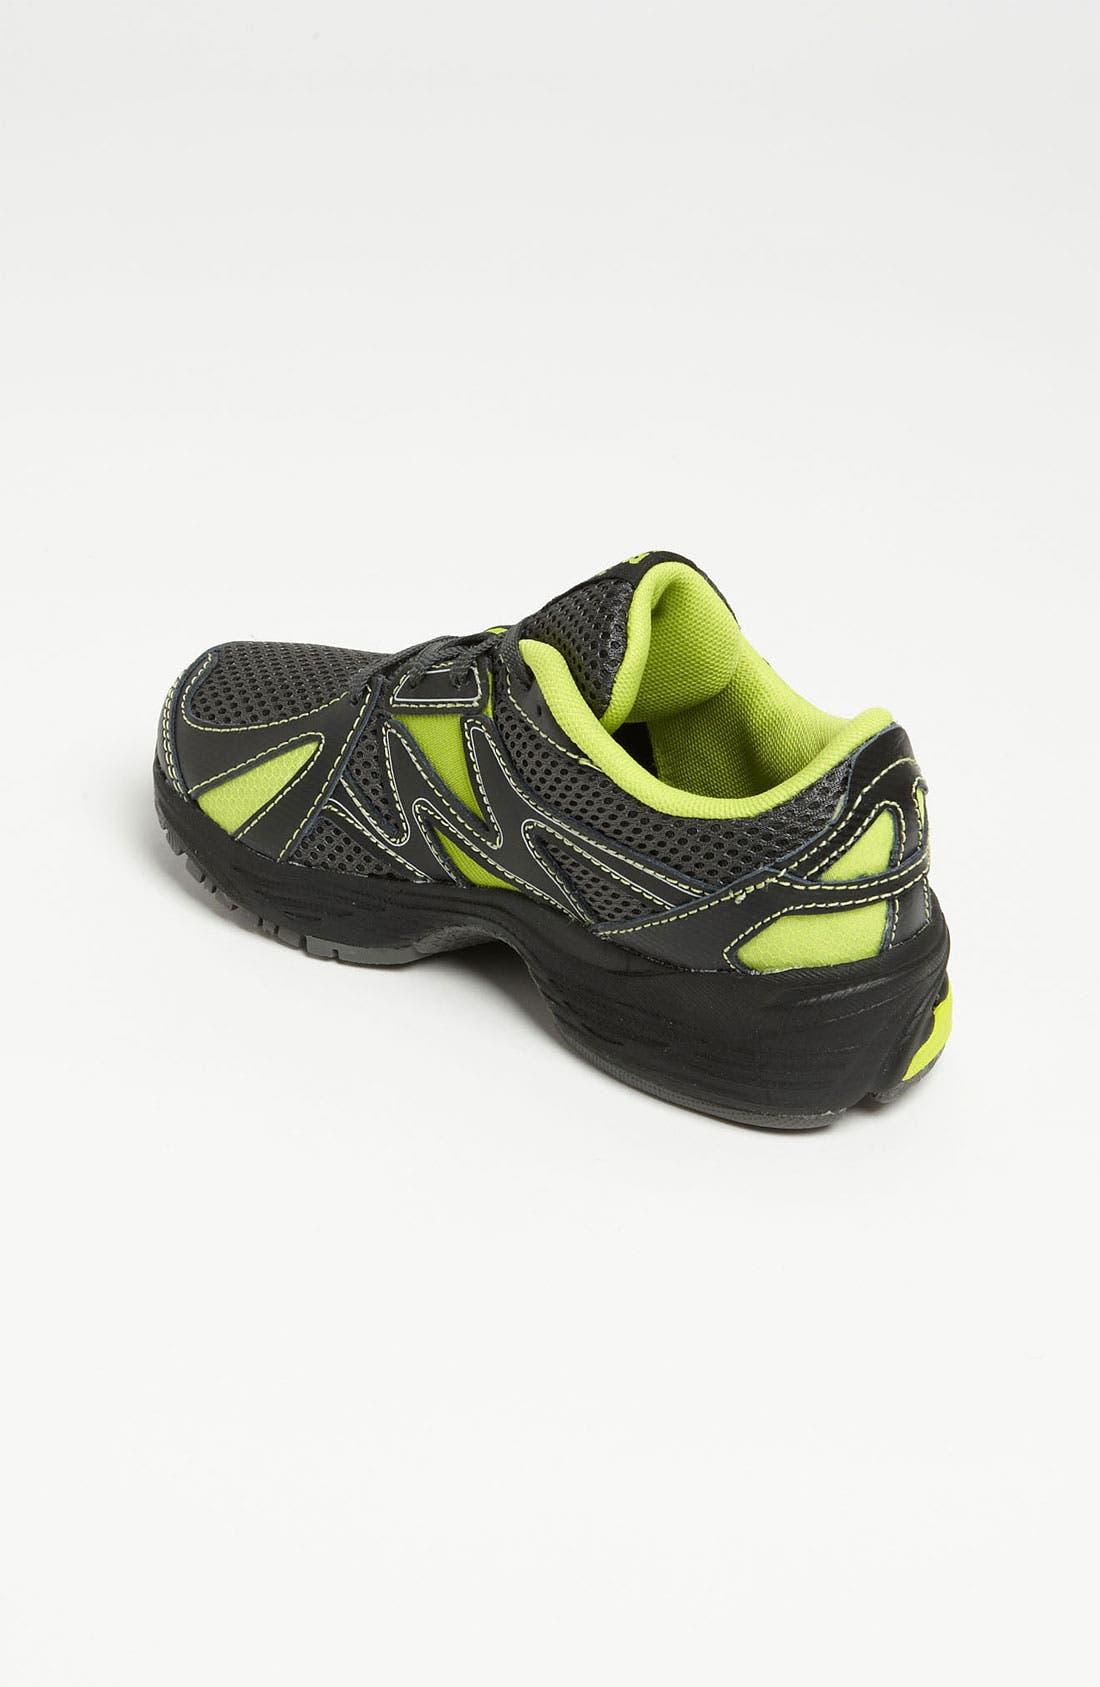 Alternate Image 2  - New Balance '634' Running Shoe (Toddler, Little Kid & Big Kid)